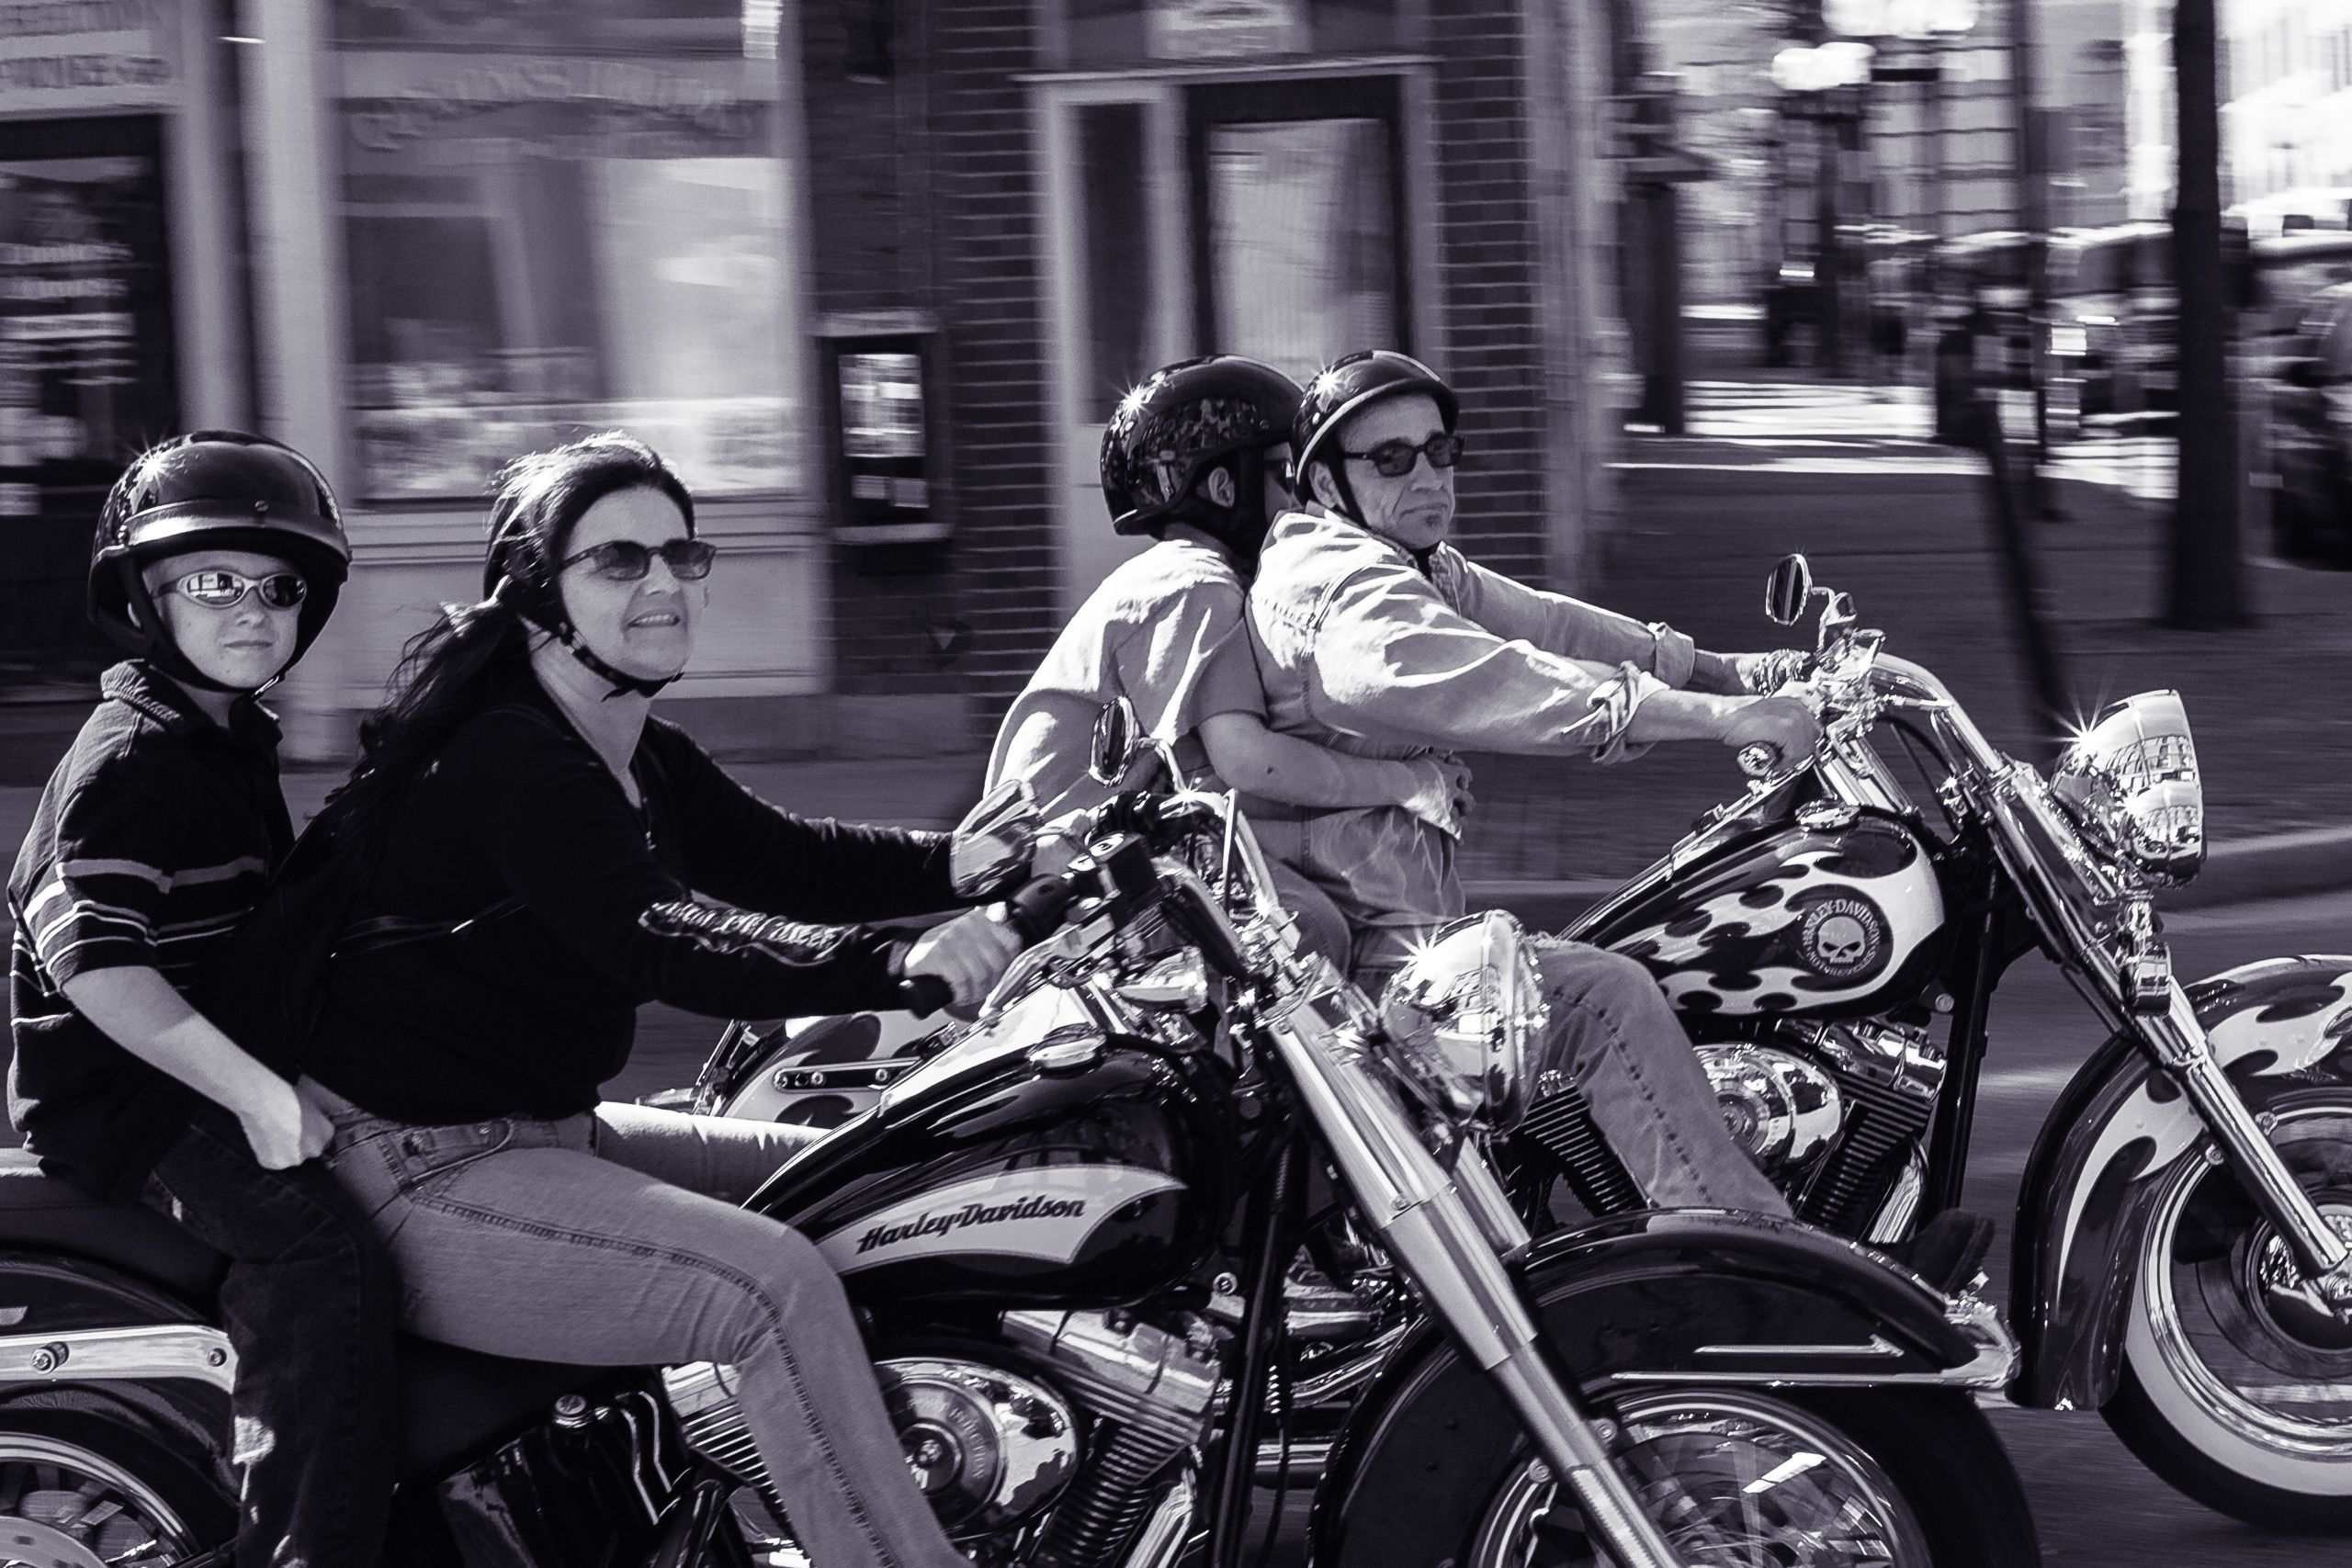 Lowell Bikes-2560px-070421-6612.jpg